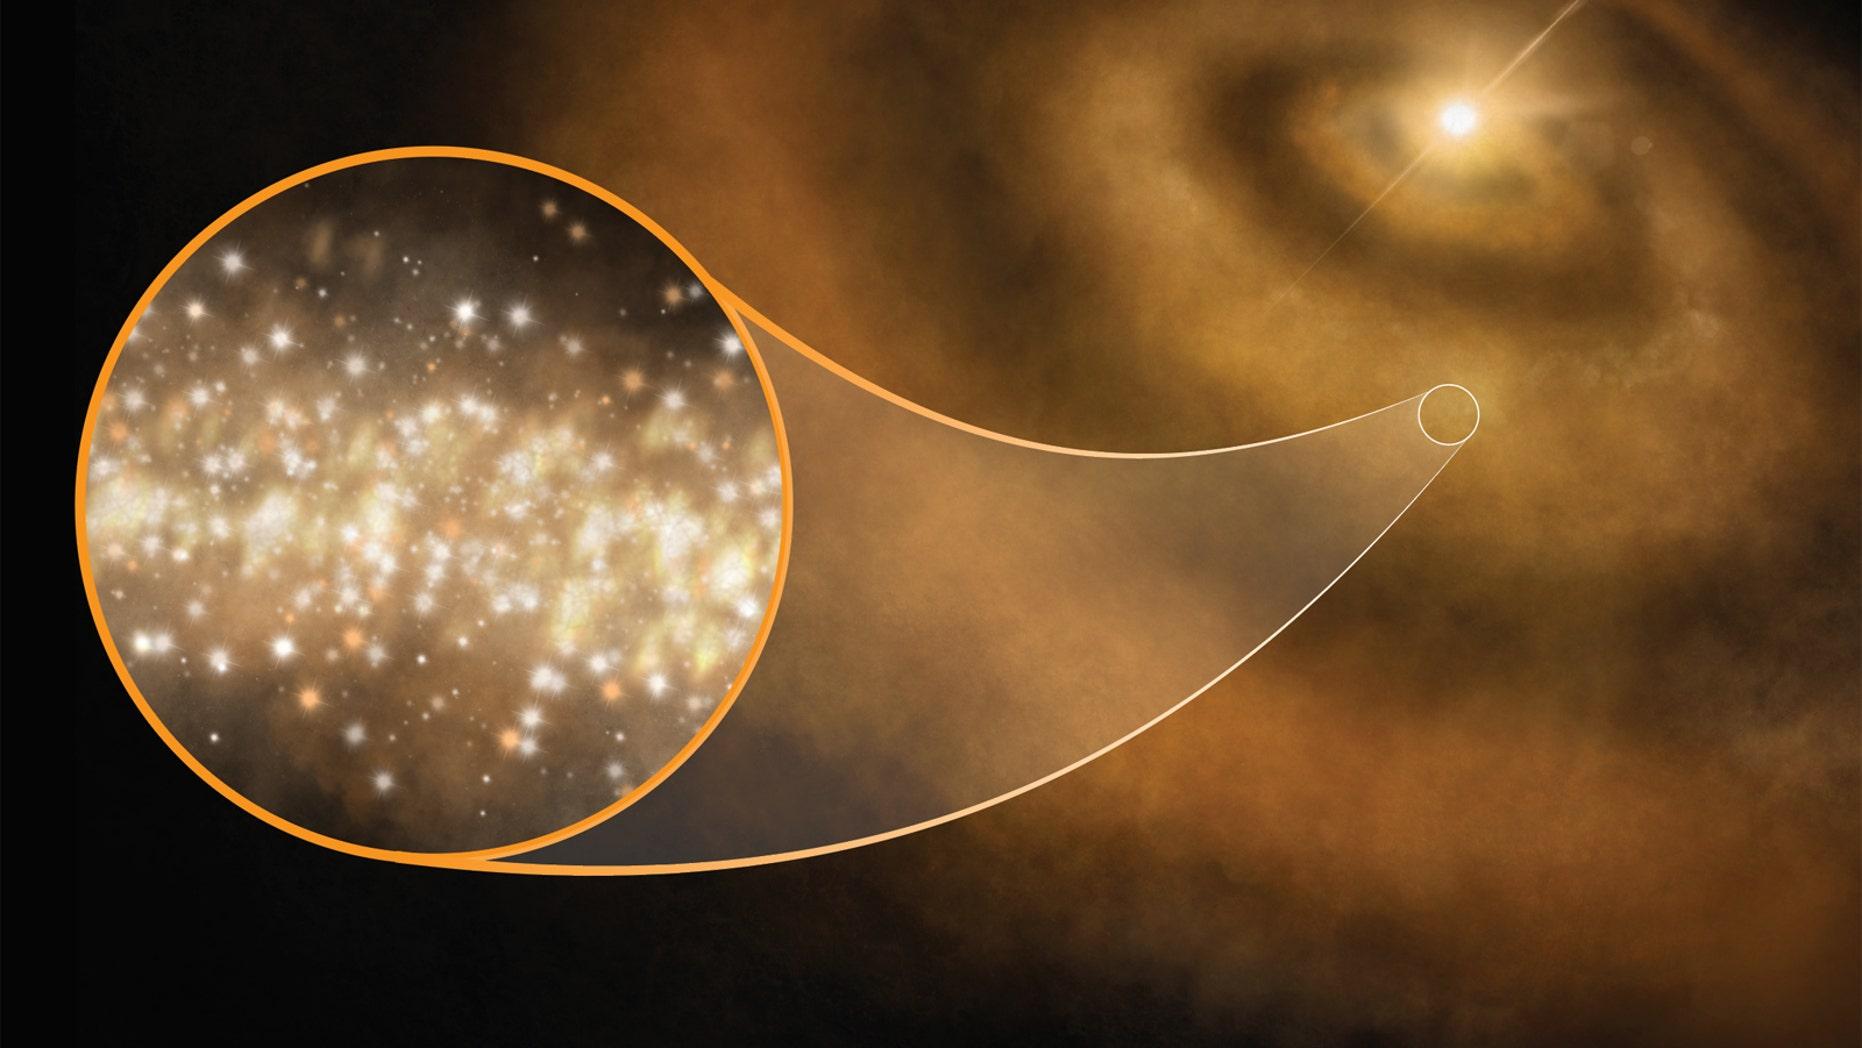 An artist's illustration of nanodiamonds (tiny nanoscale diamonds) around a young star in our Milky Way galaxy.